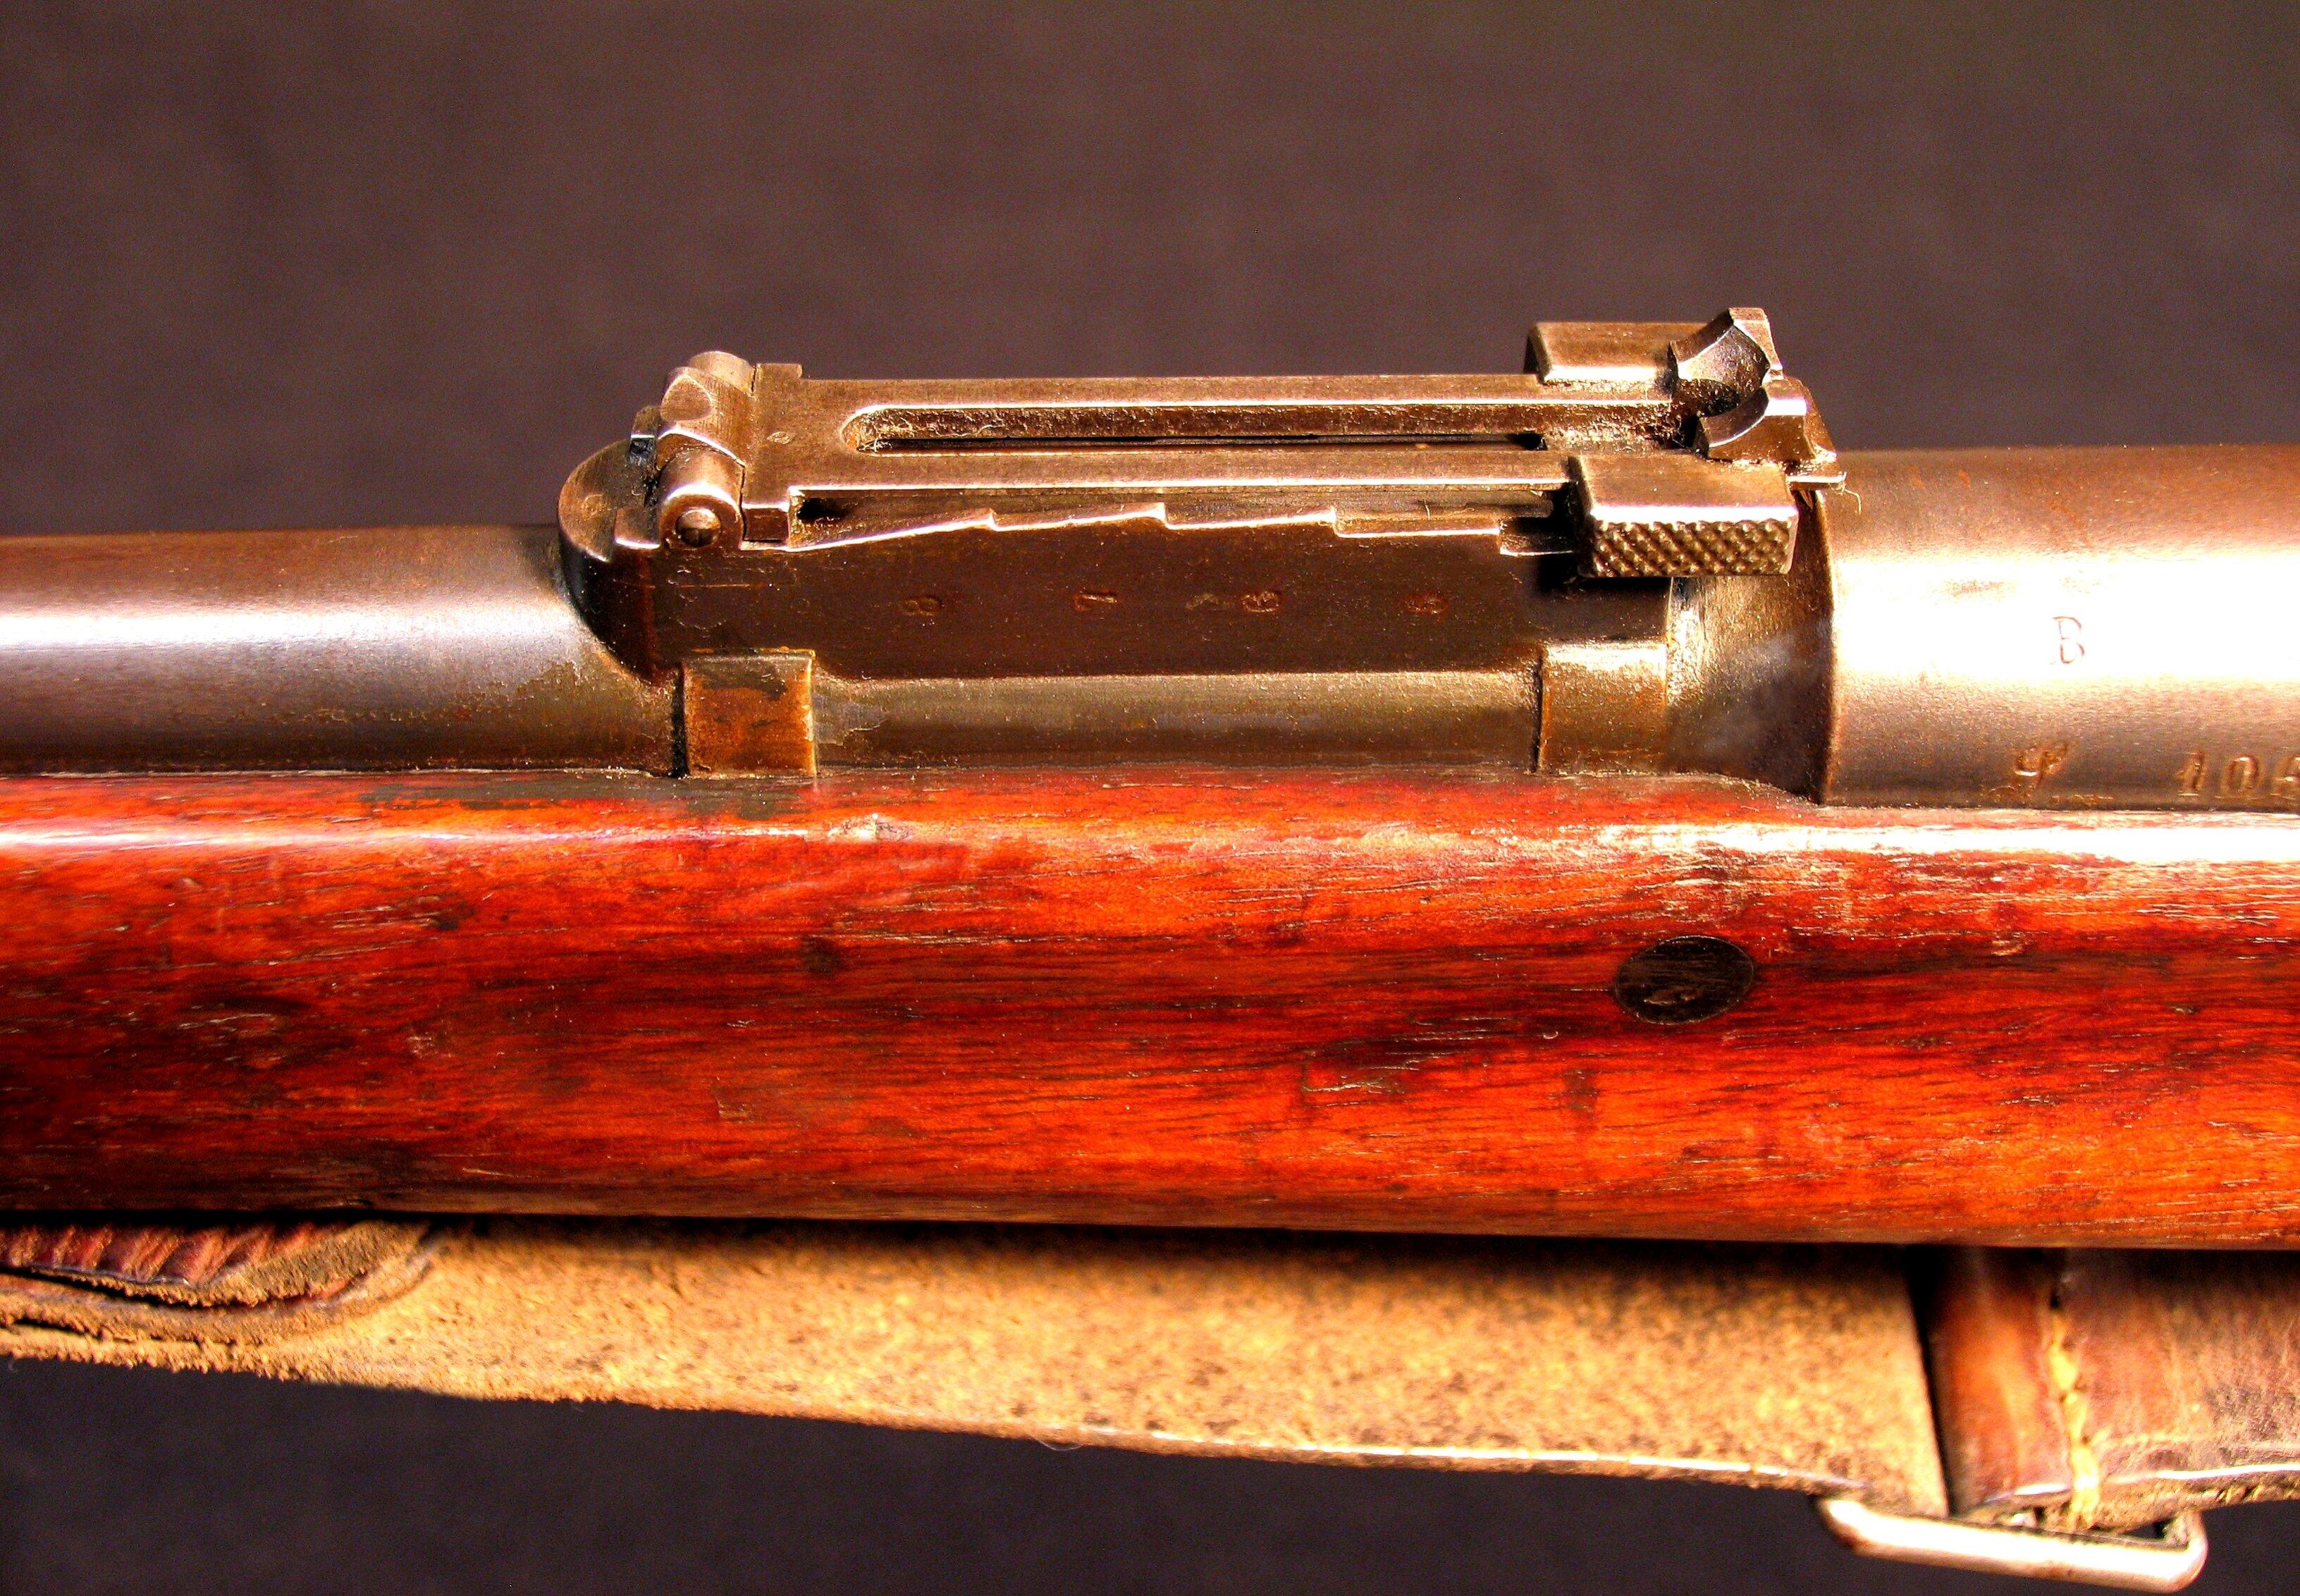 Click image for larger version.  Name:Mle 1886 Lebel Rifle 01B (7).jpg Views:8 Size:1.39 MB ID:3687209